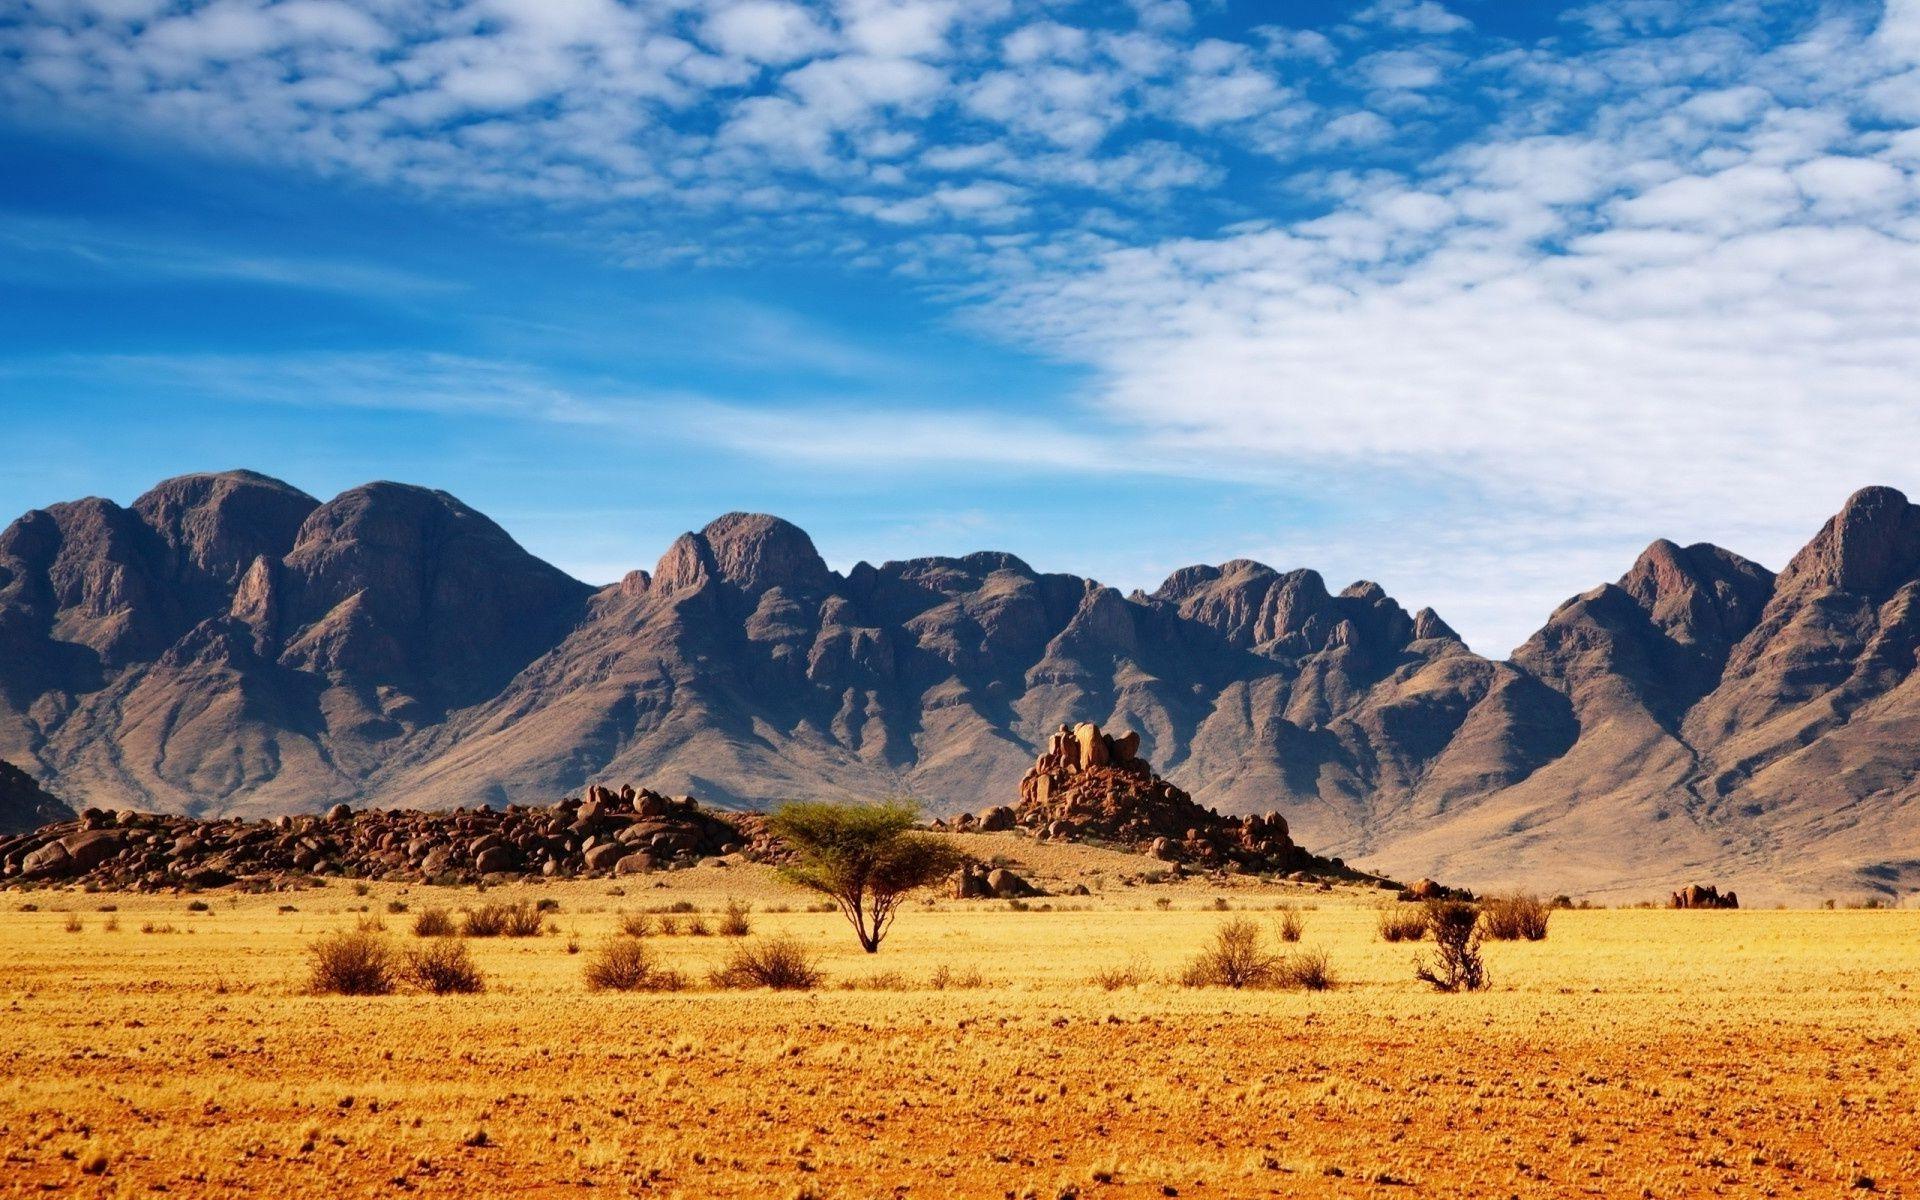 природа Намибия Африка пейзаж река без смс